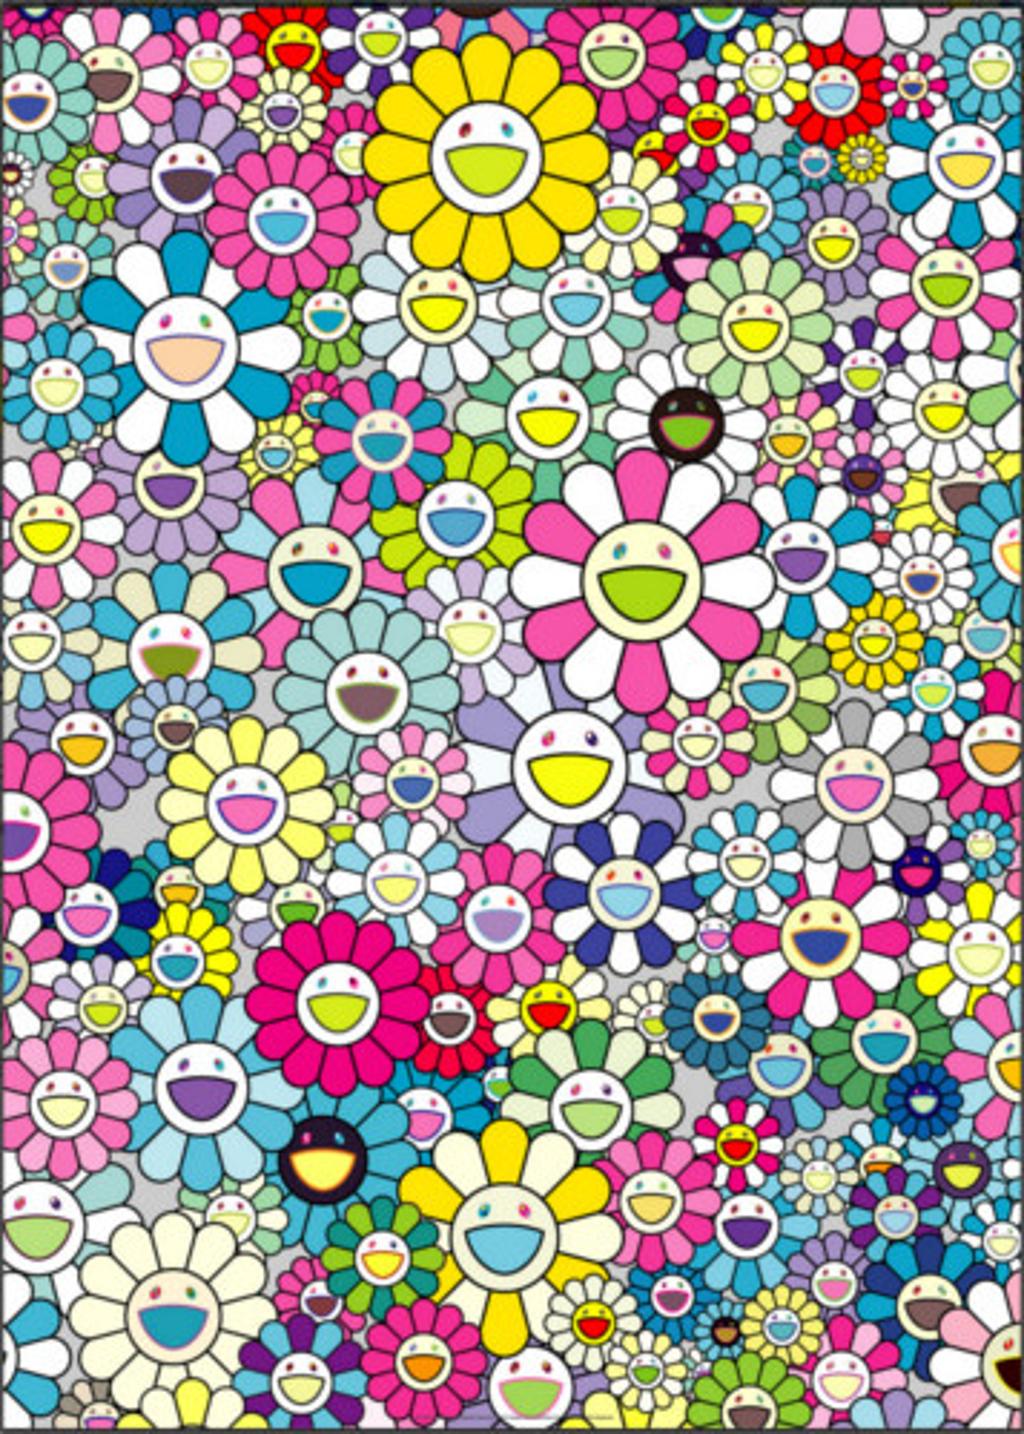 I Look Back And There, My Beautiful Memories by Takashi Murakami (b. 1962)